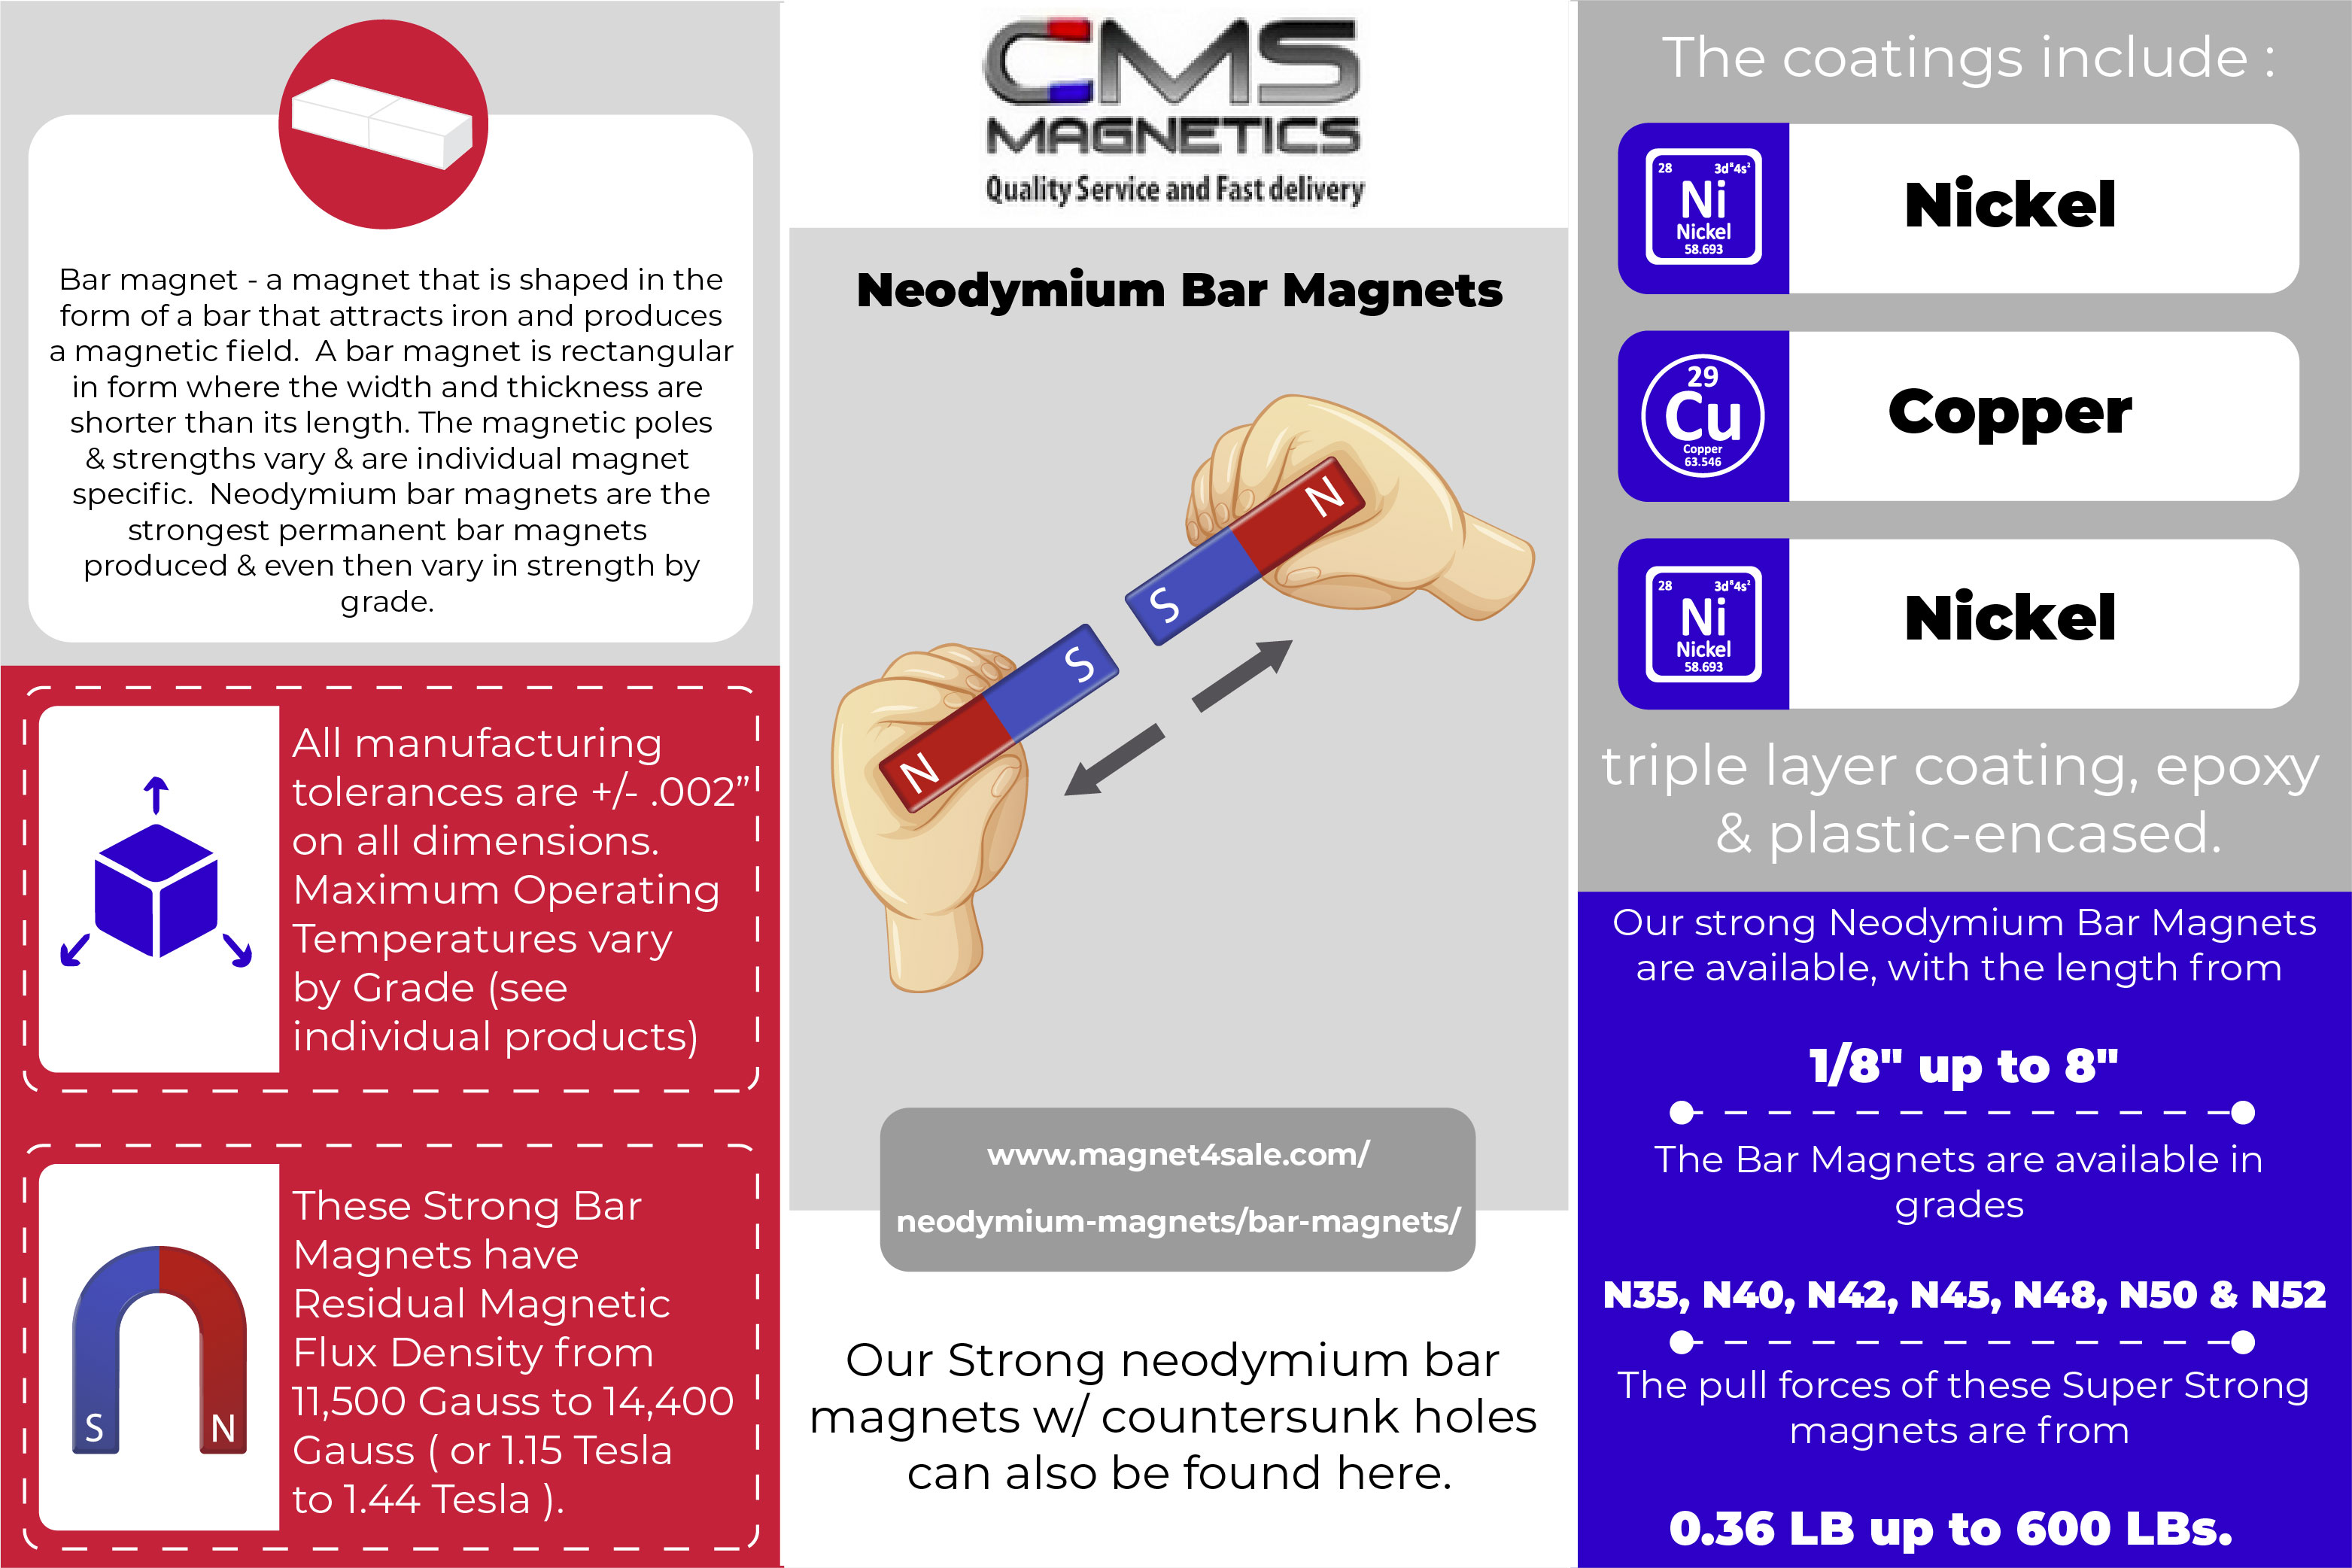 infographic2-02.jpg